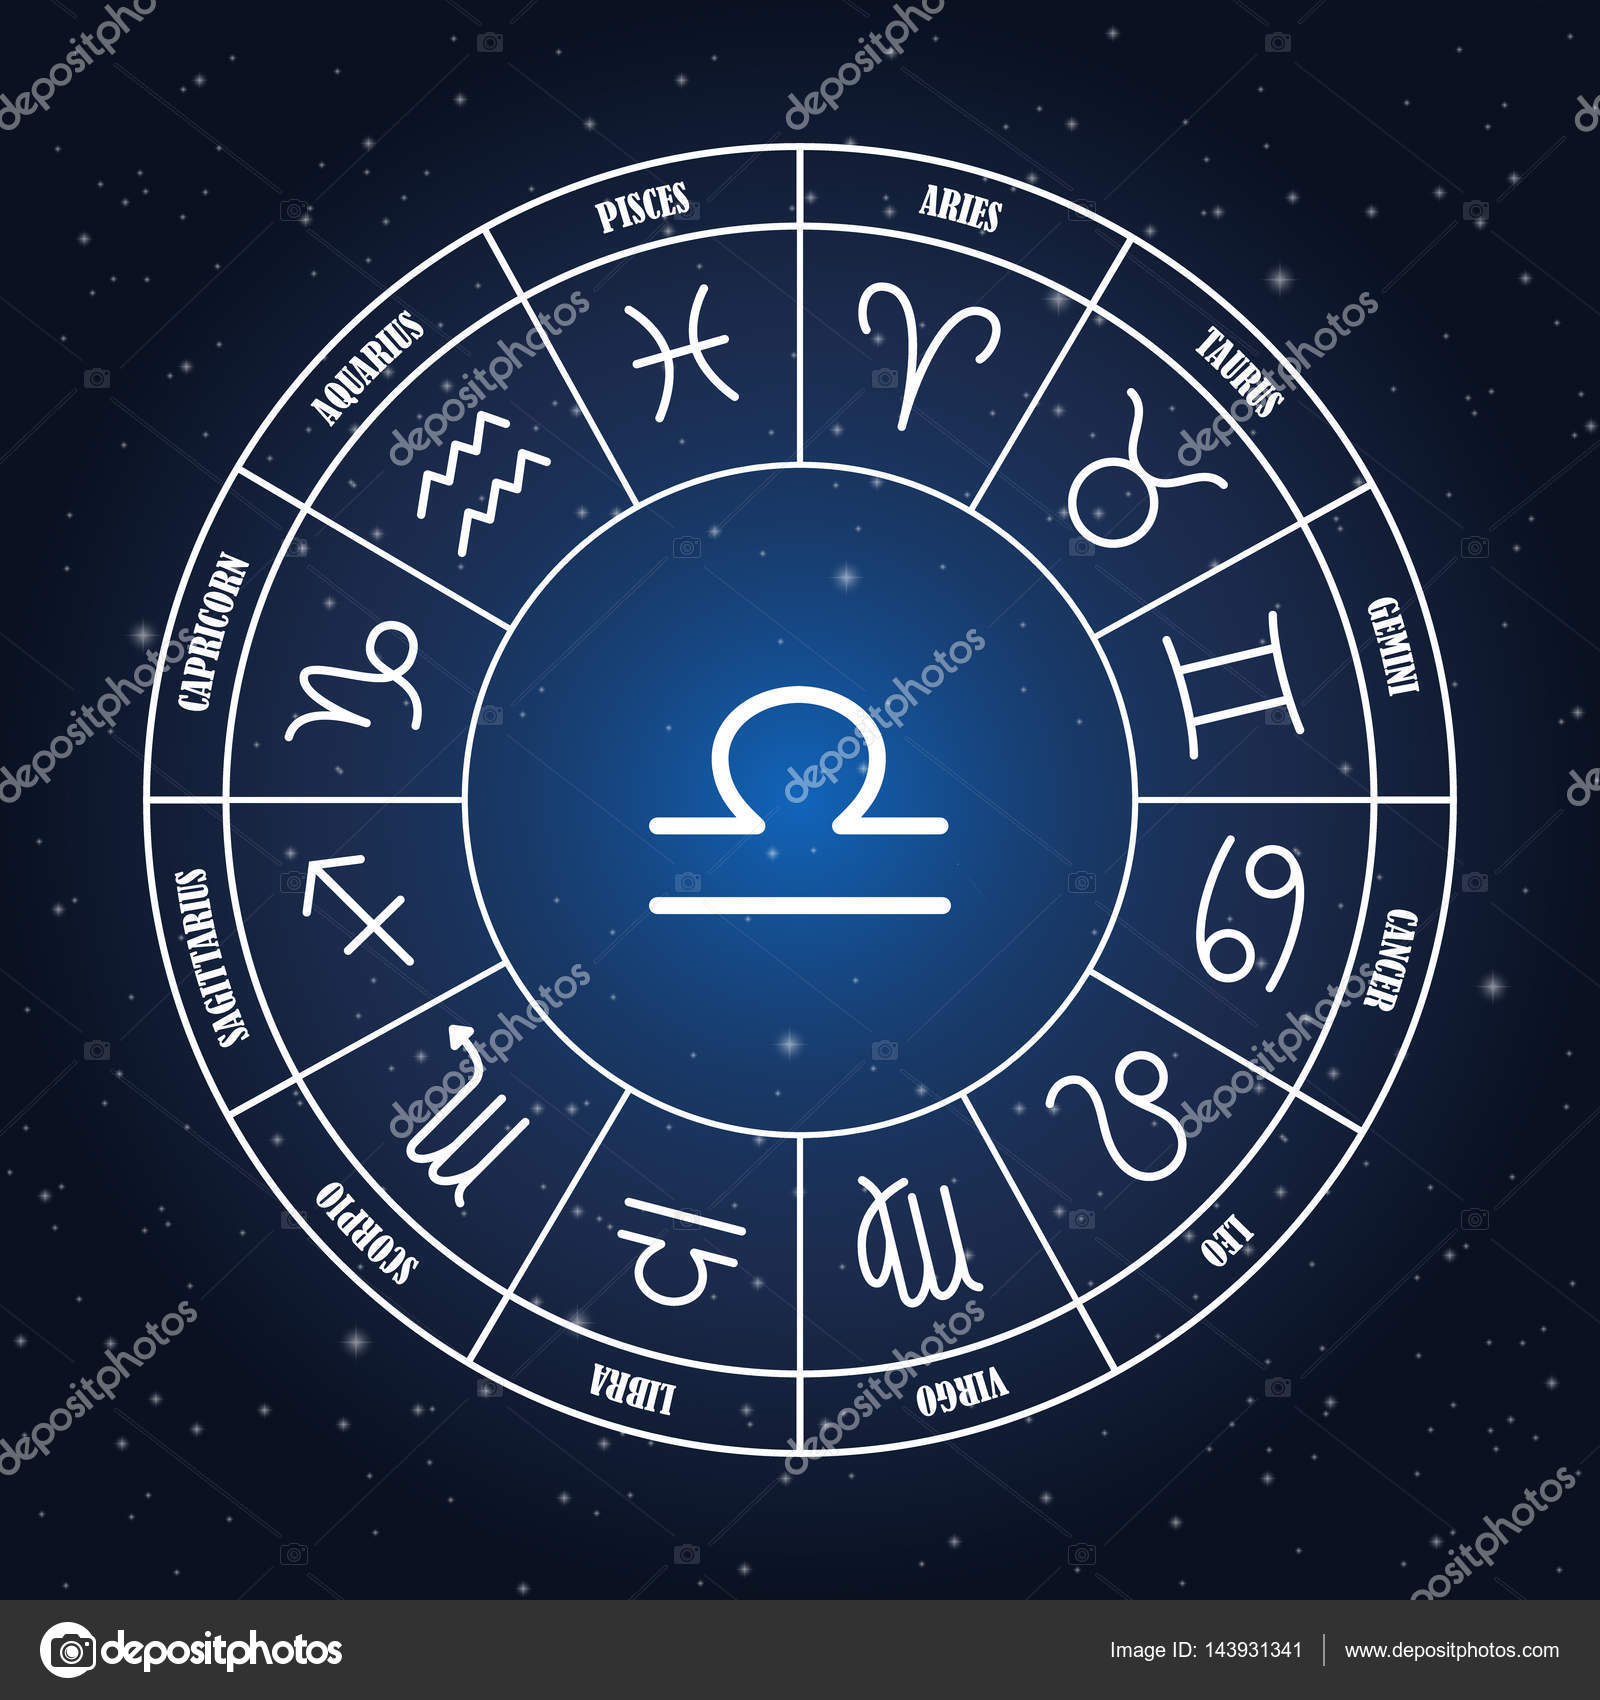 libra astrology images